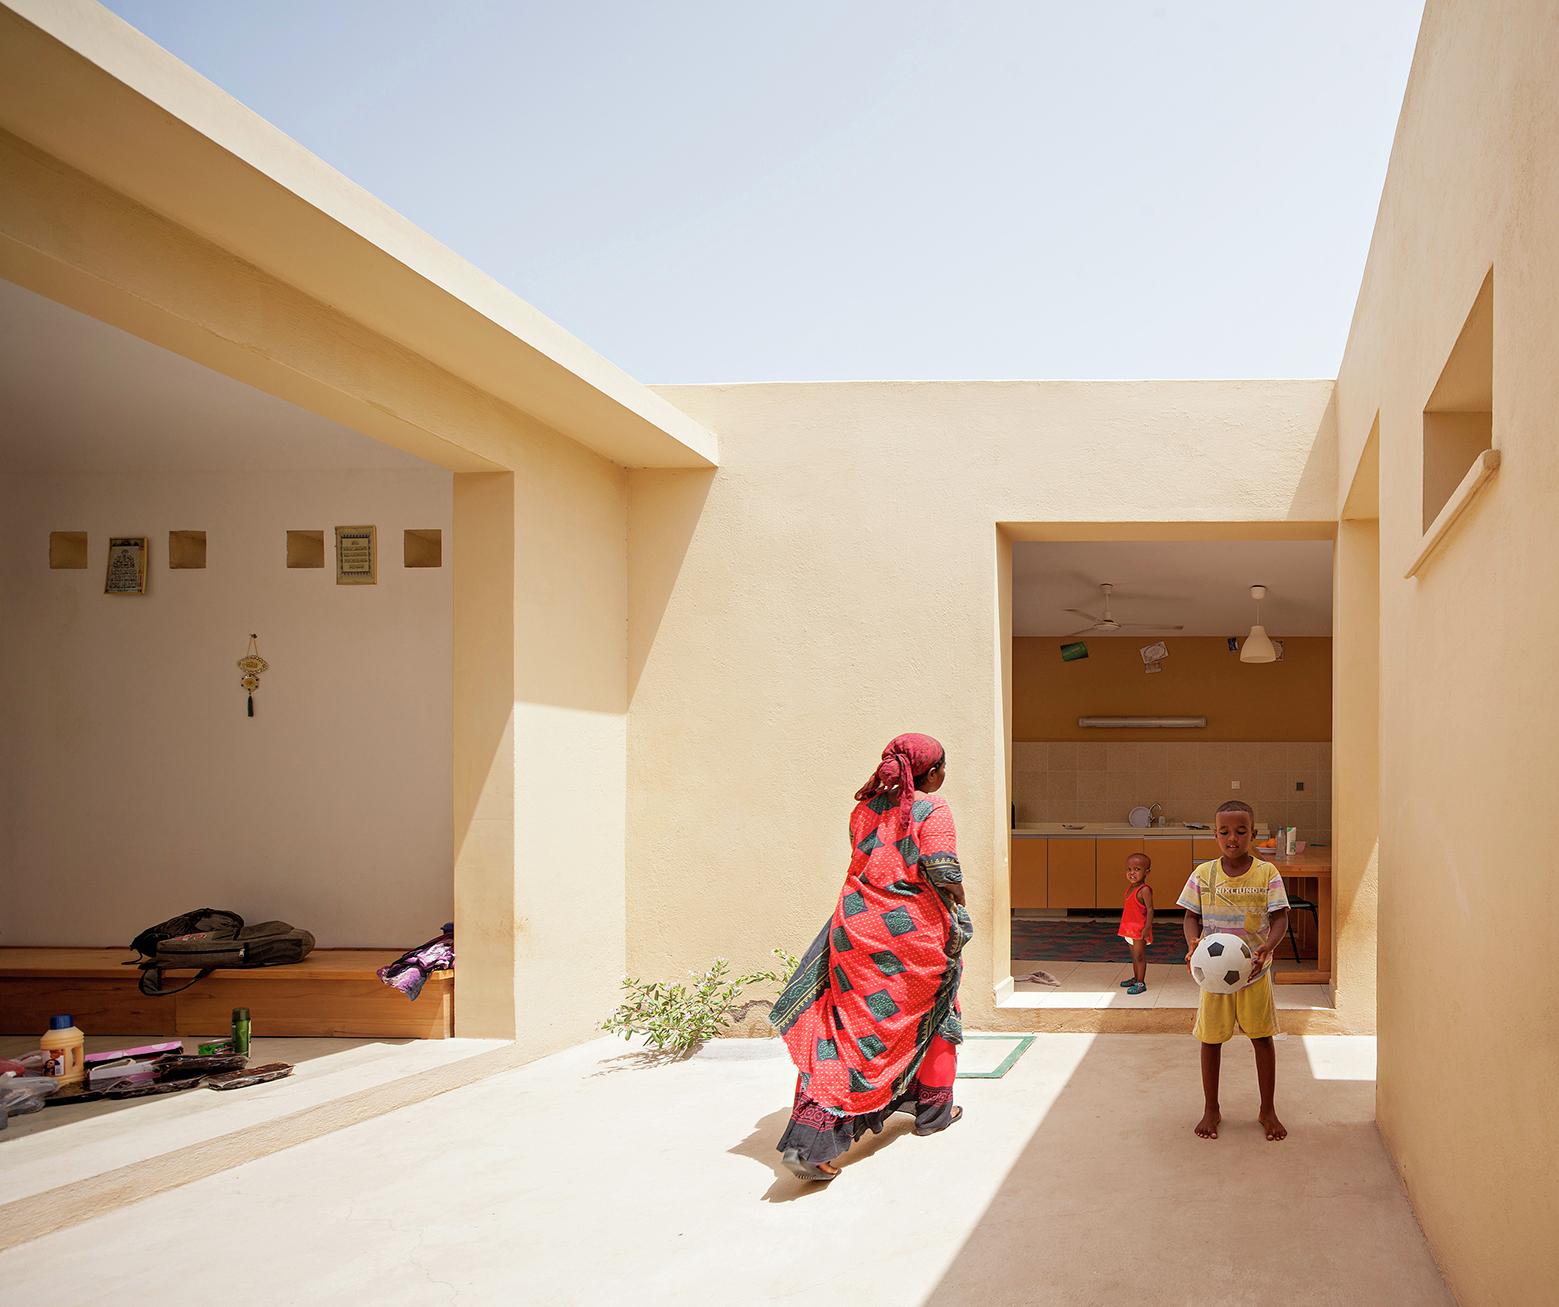 SOS_Village_Djibouti_-_Houses_(17).jpg